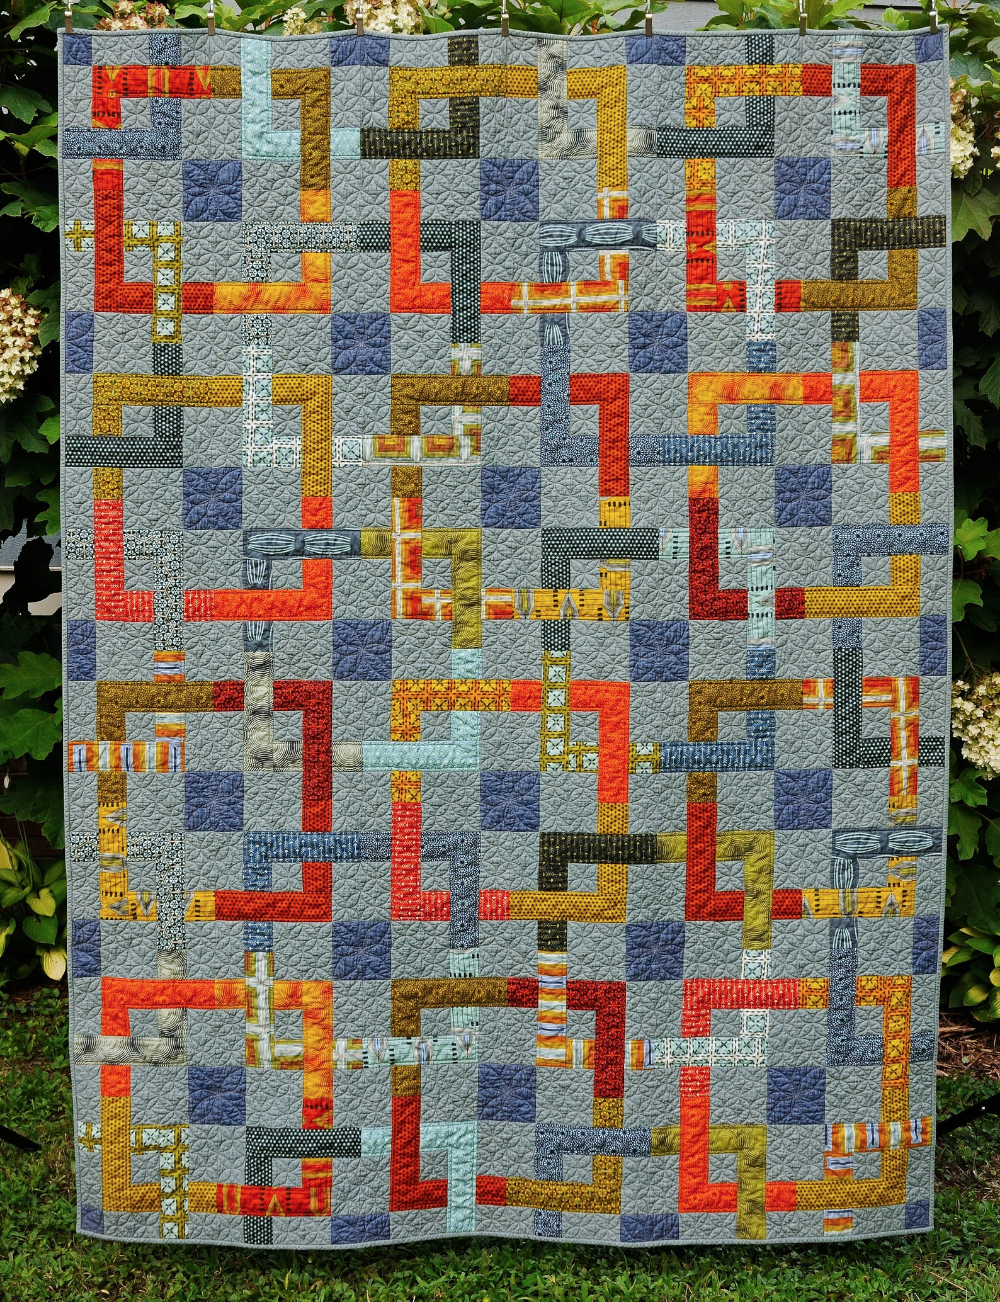 Img 5757 Jpg 829 553 Pixels Patchworkmuster Patchwork Muster